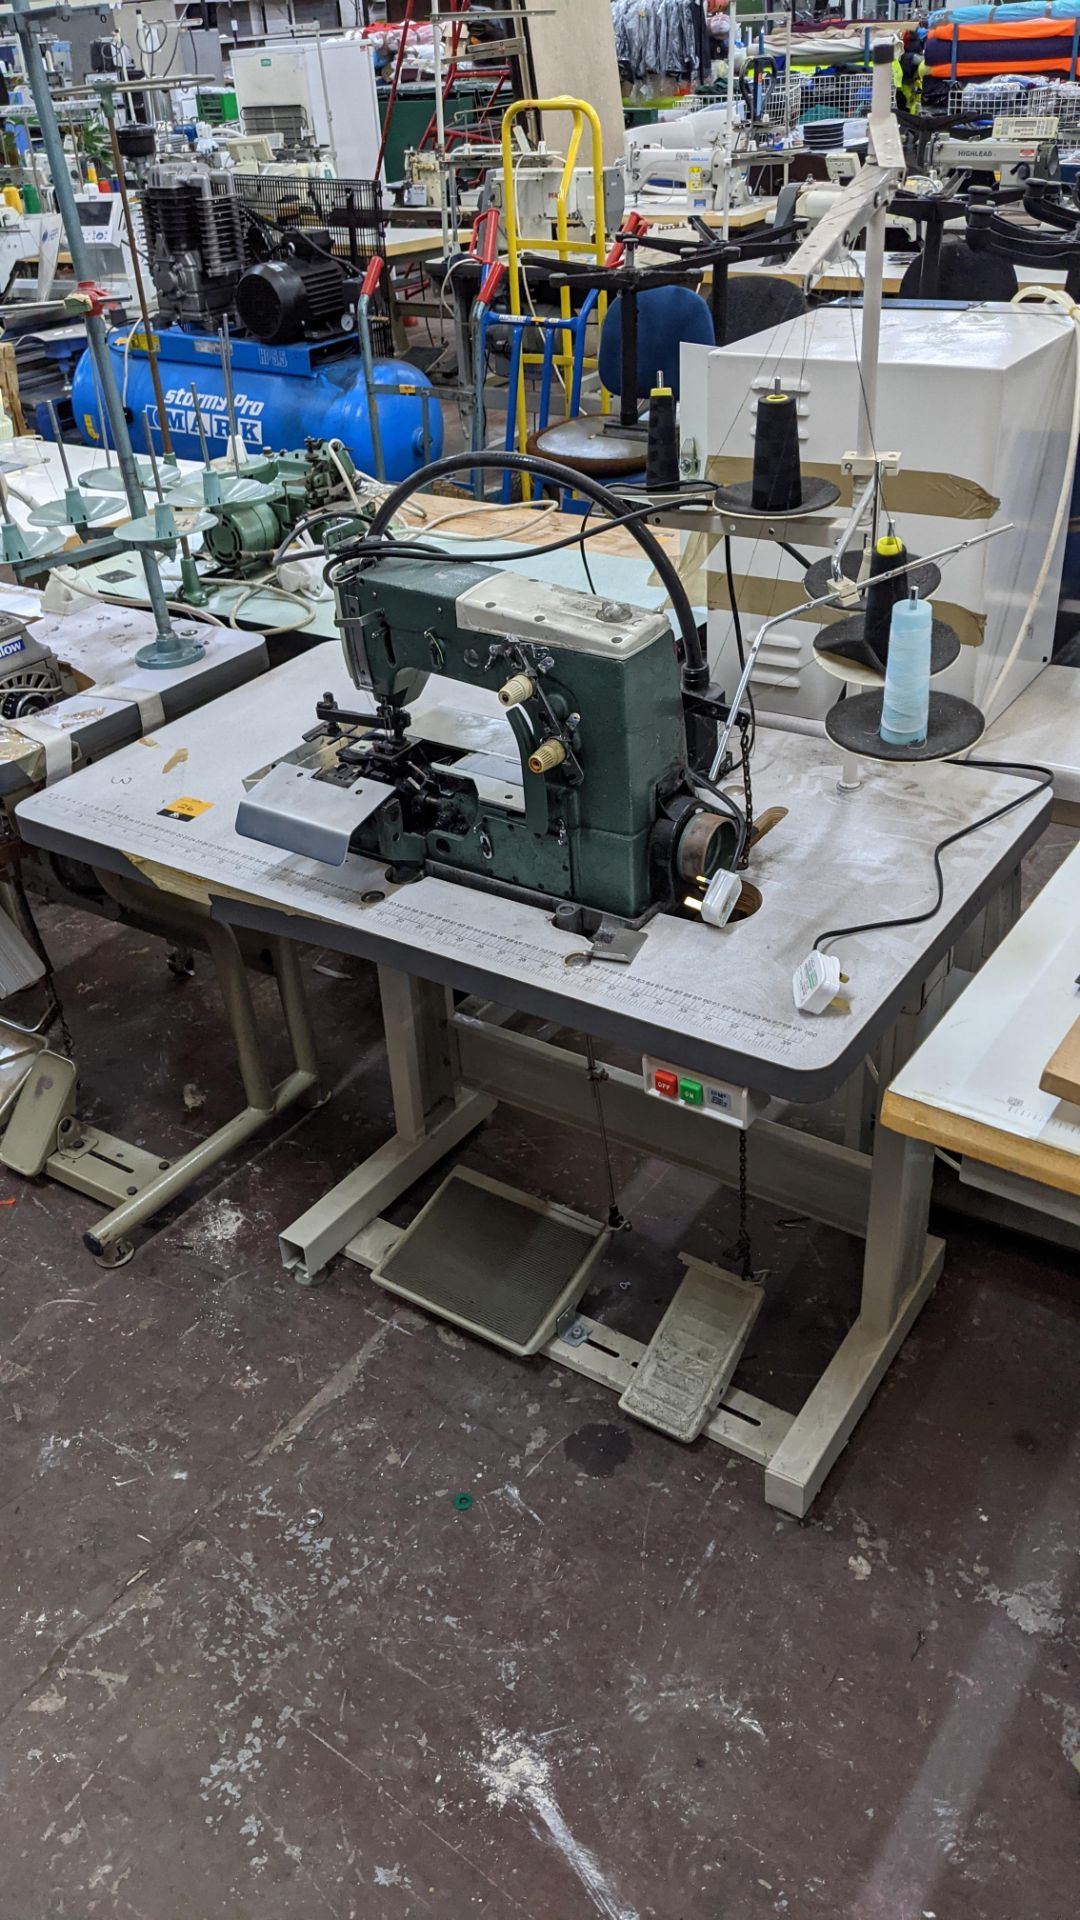 Sewing machine - Image 2 of 16